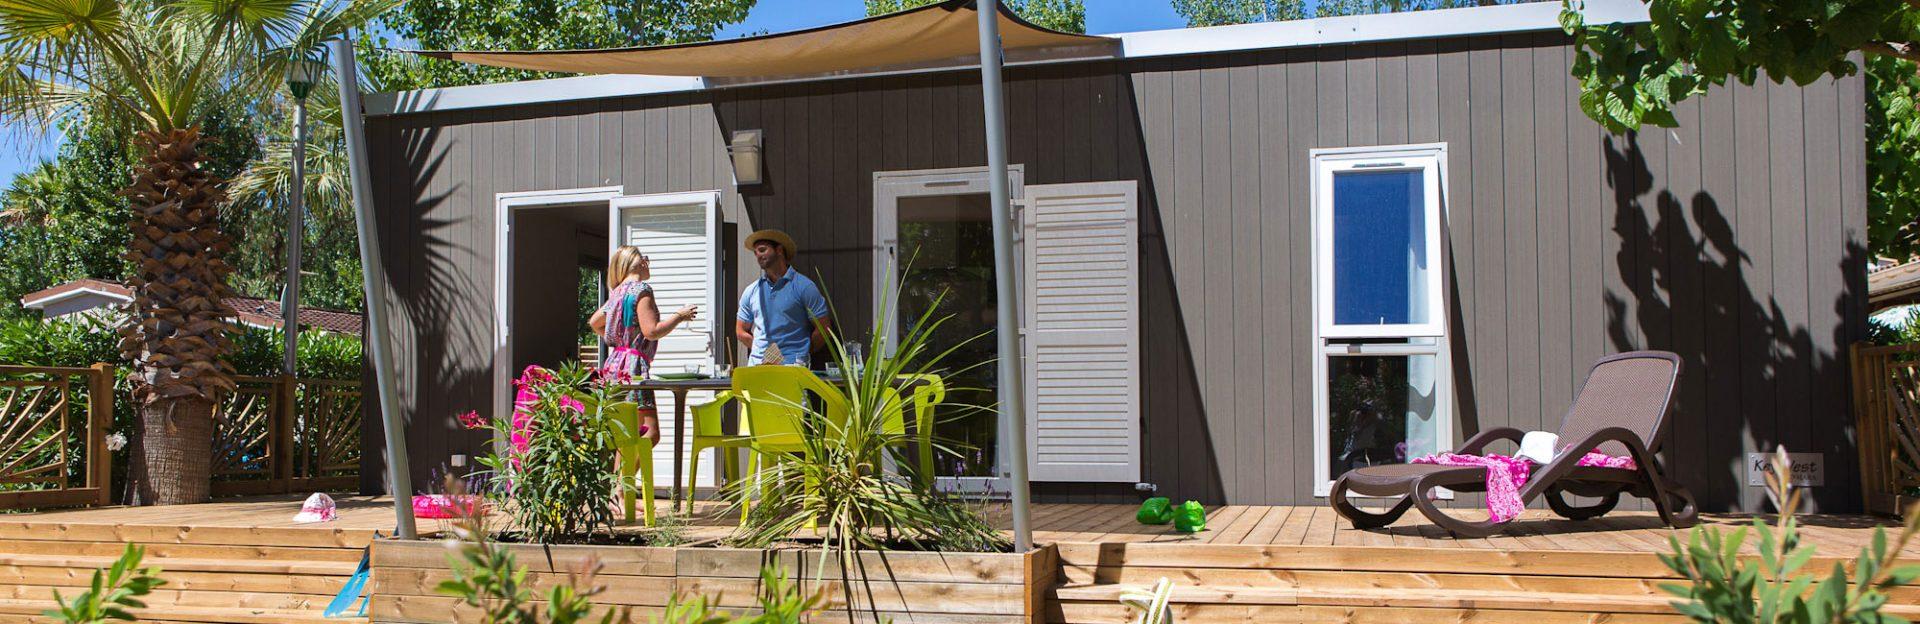 Camping L'air Marin : Hacienda Principale Diapo